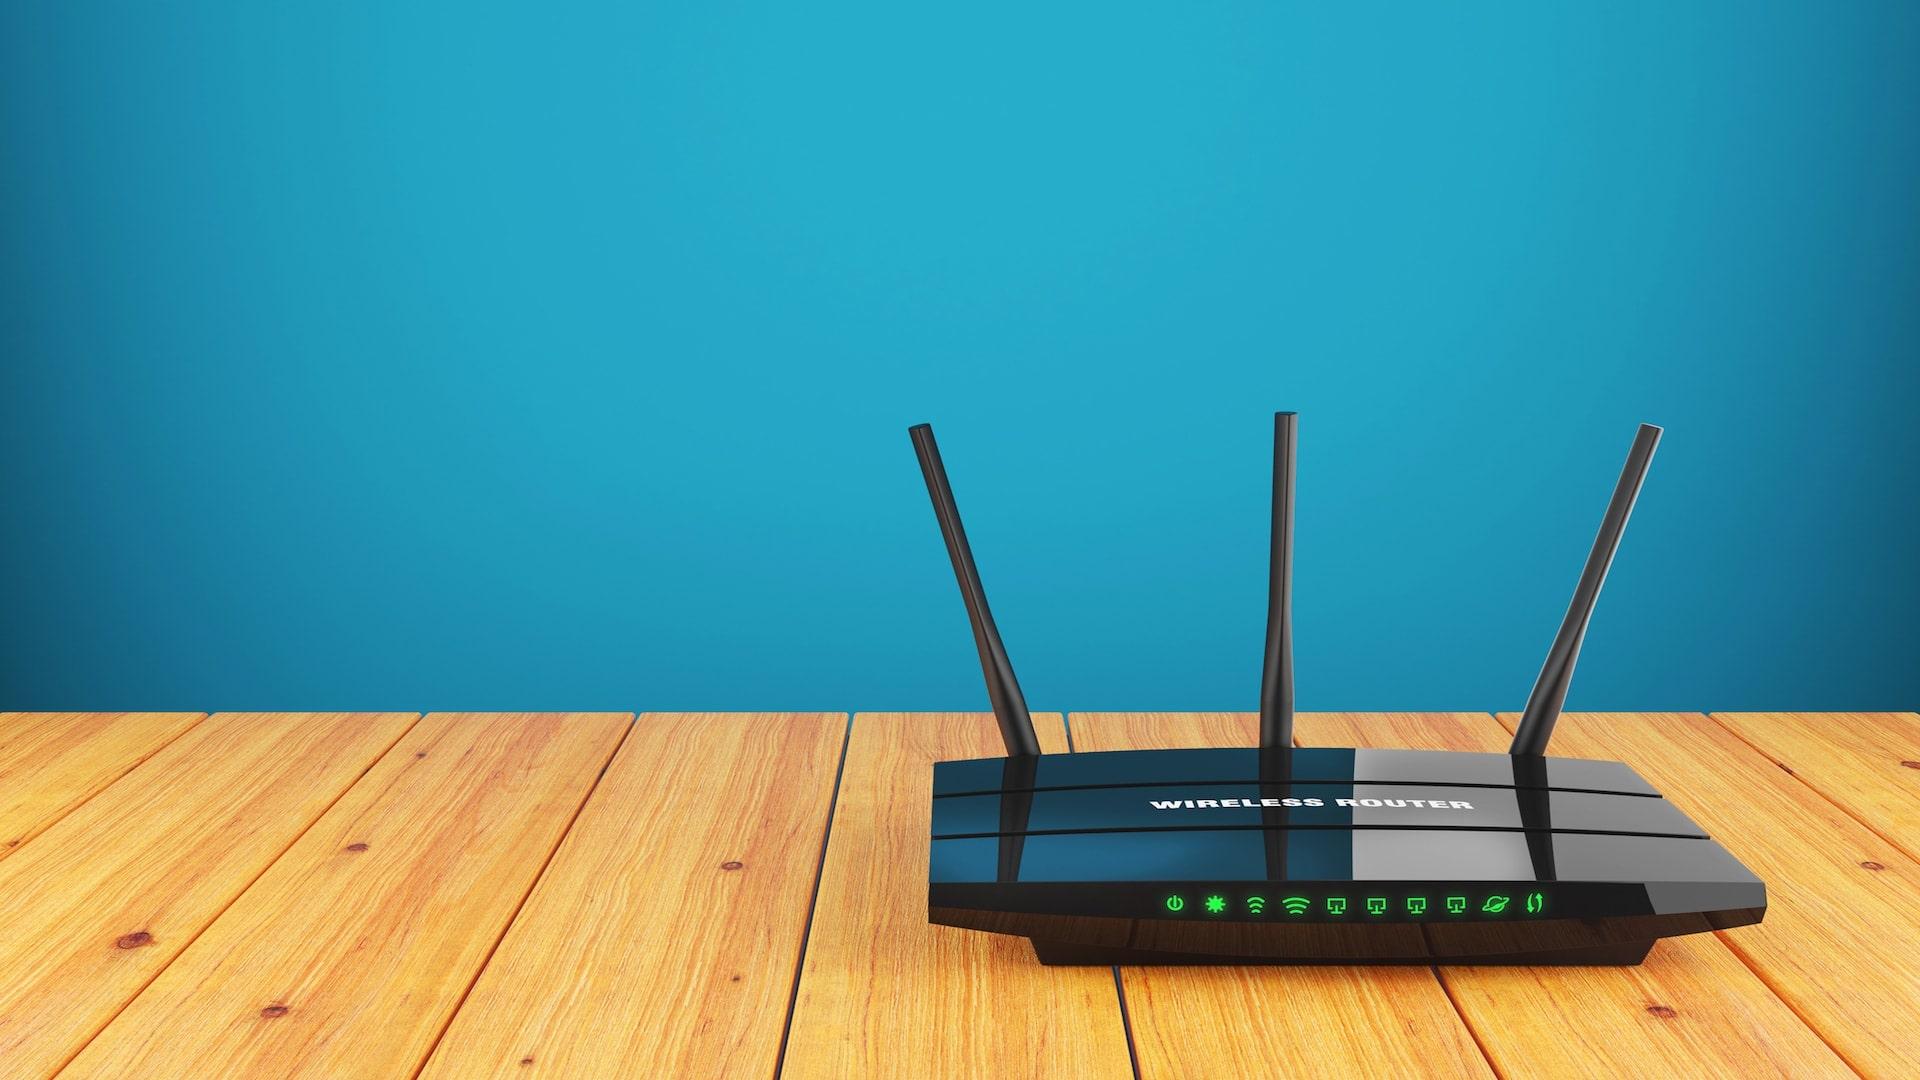 Installation de box Internet, connexion & wifi